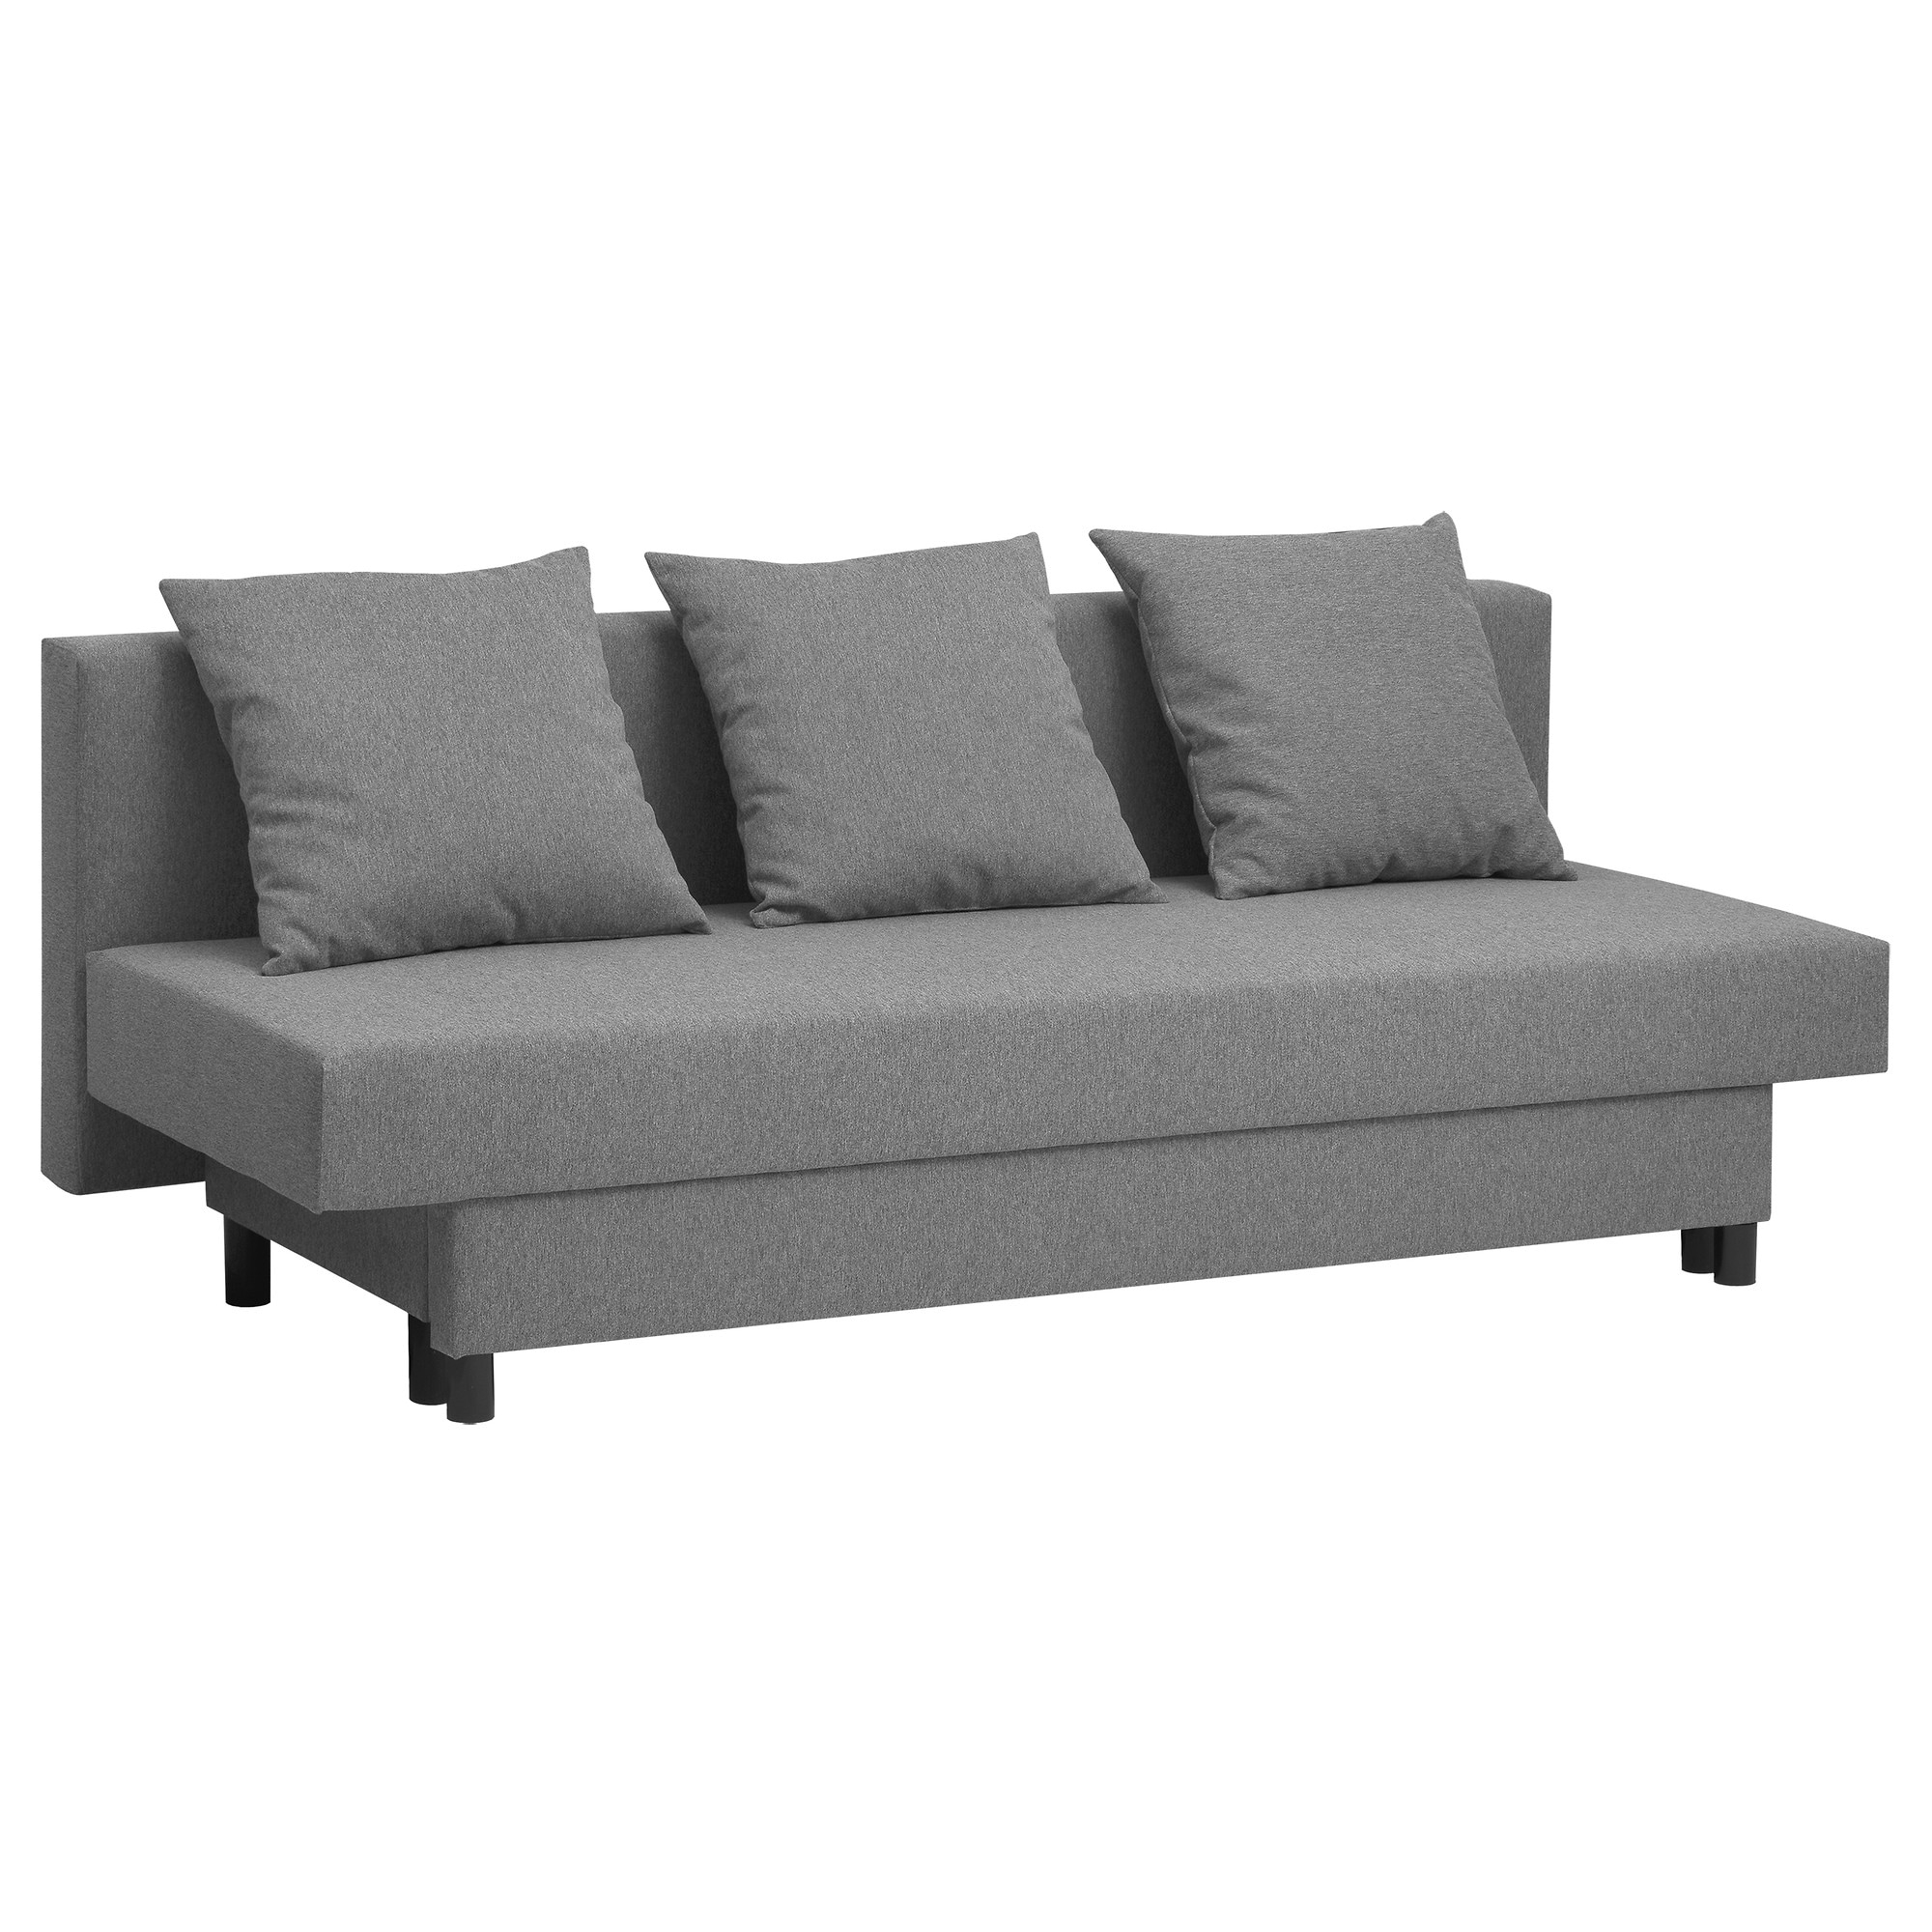 Sofa Cama Con Arcon Ipdd asarum sofà Cama 3 Plazas Gris Ikea